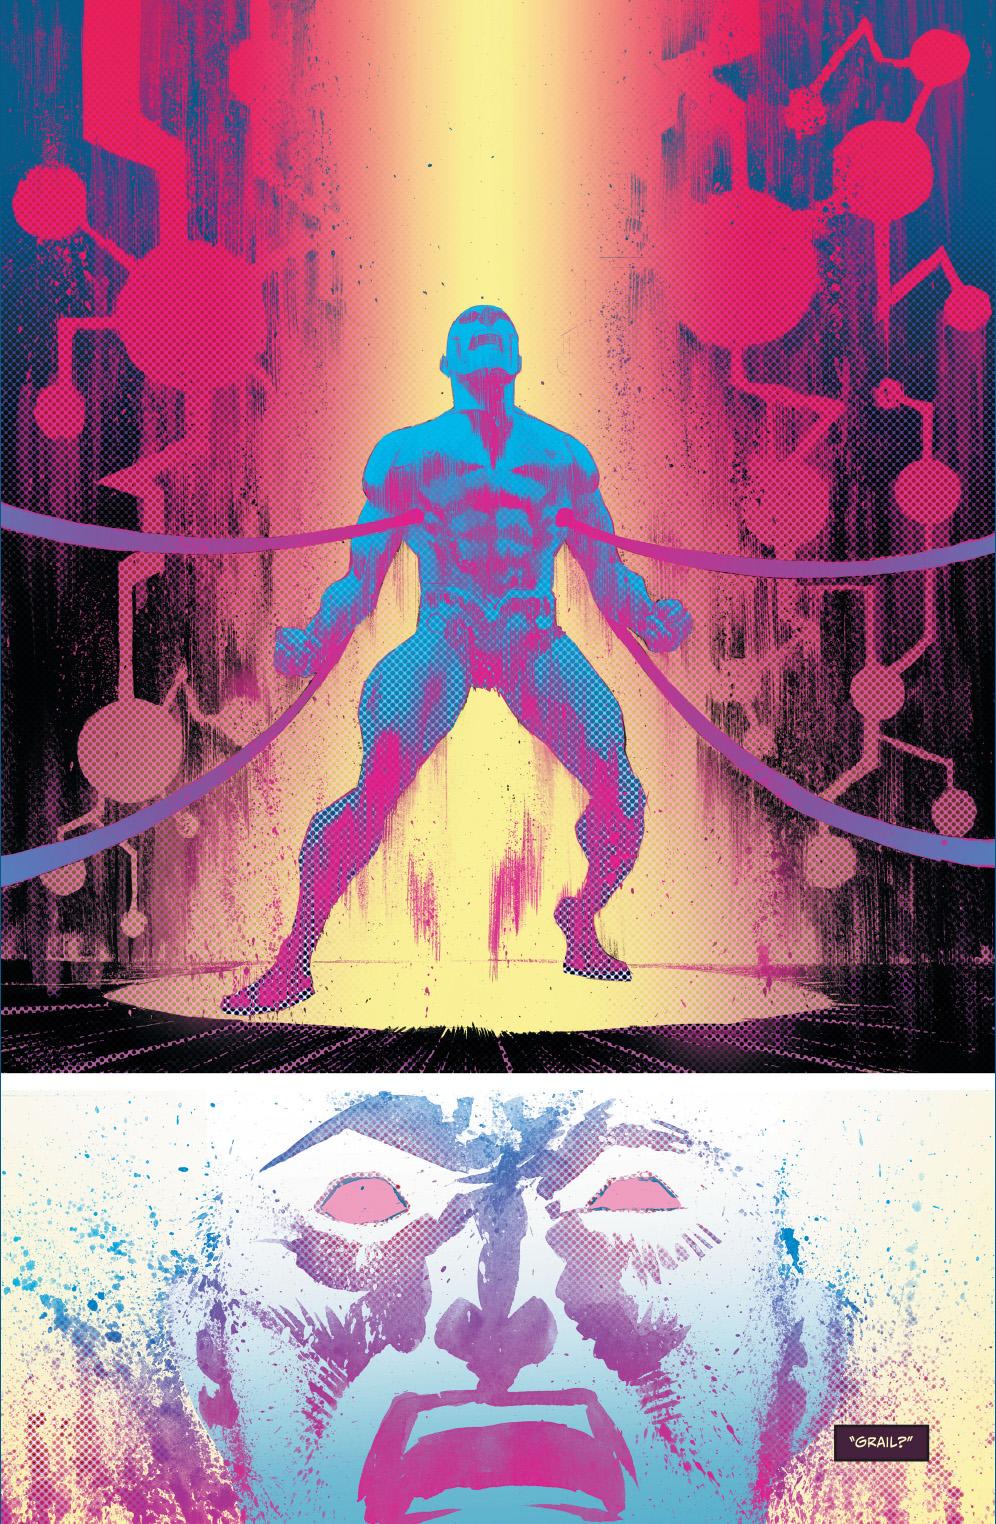 lex luthor becomes the god of apokolips 2